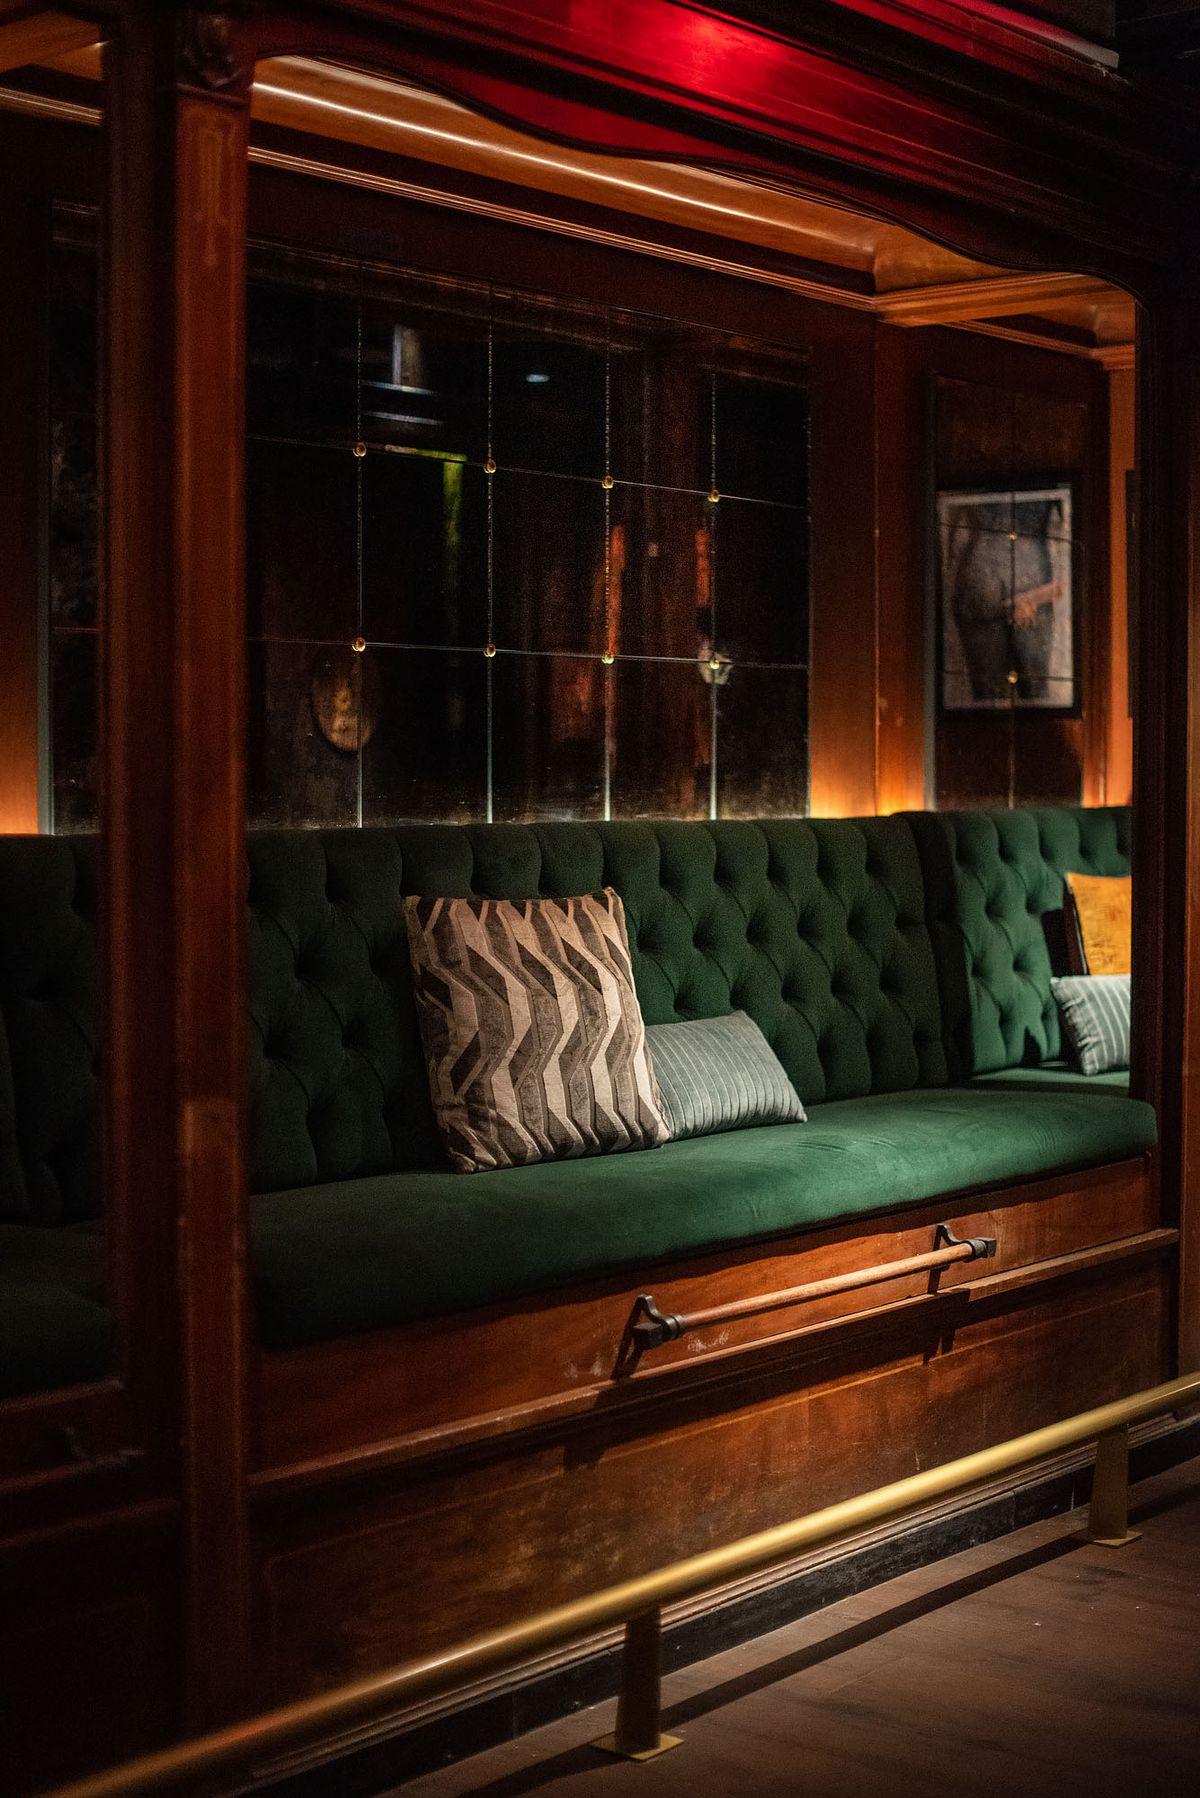 A plush dark green reading nook inside a bar.